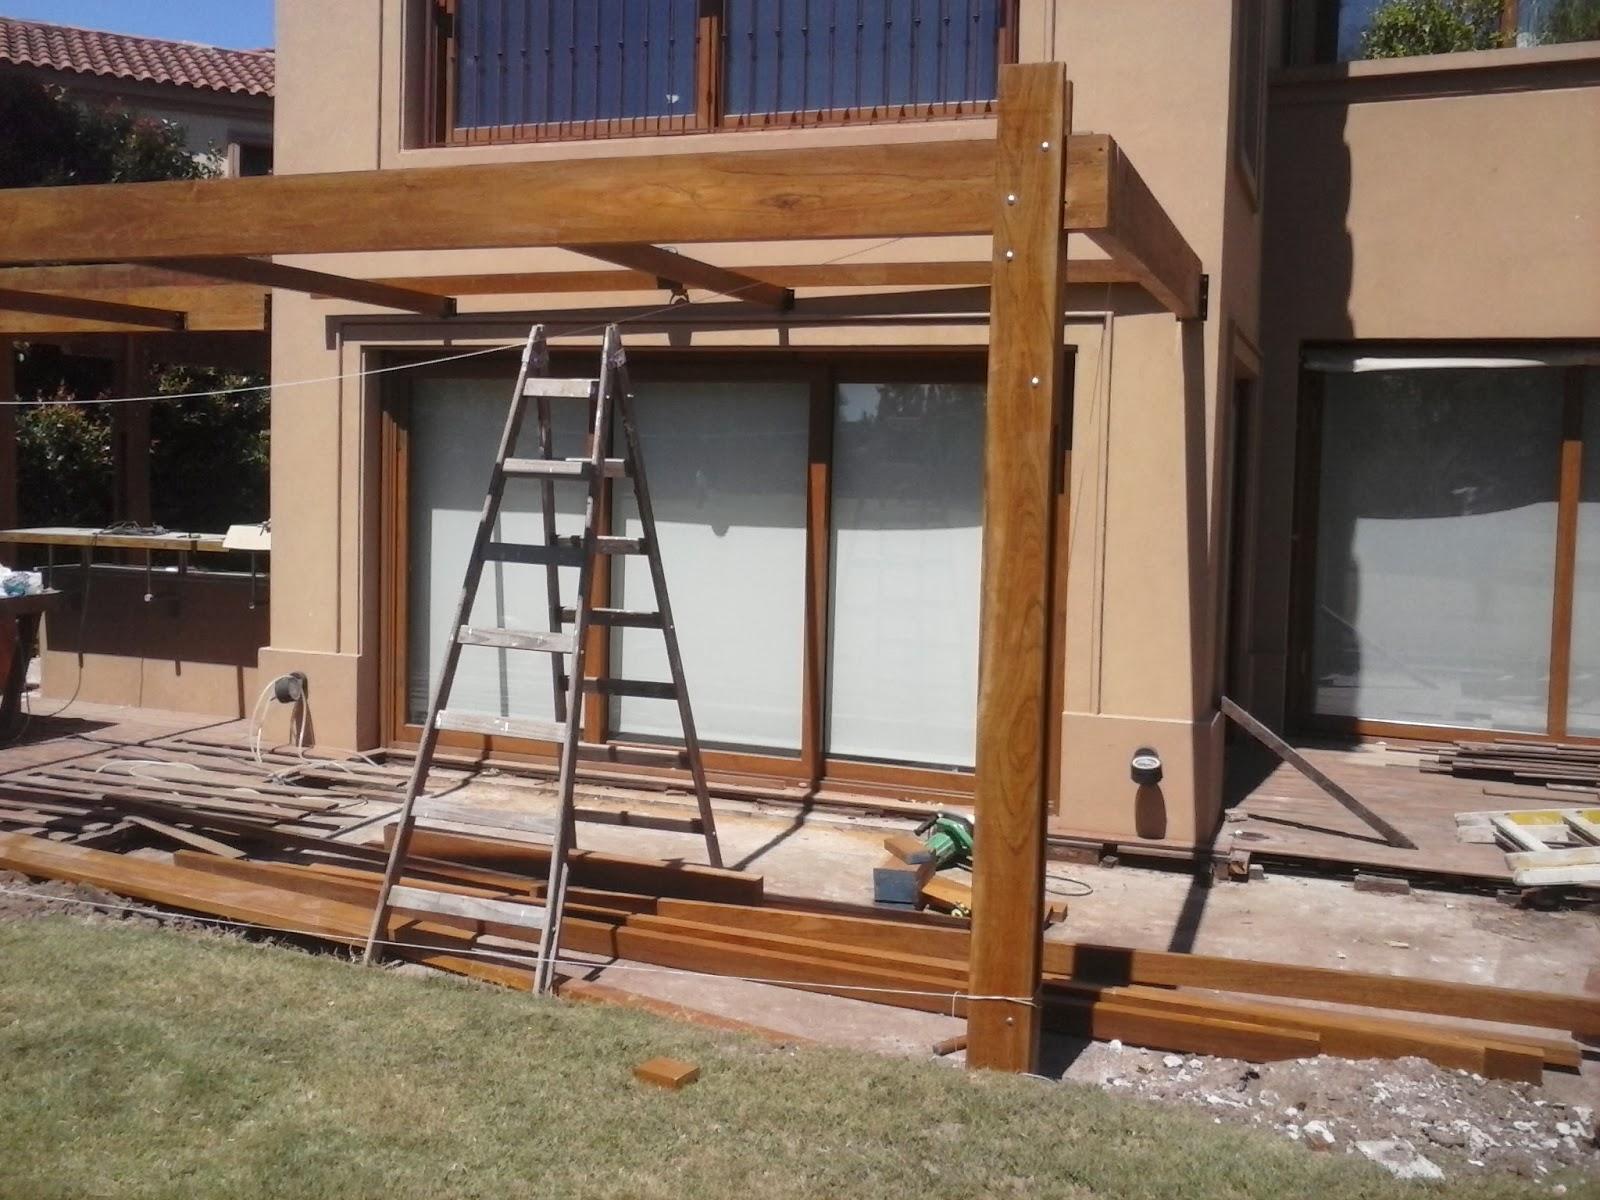 Mymdecks pergola de madera lapacho 45 m2 - Como hacer una pergola ...